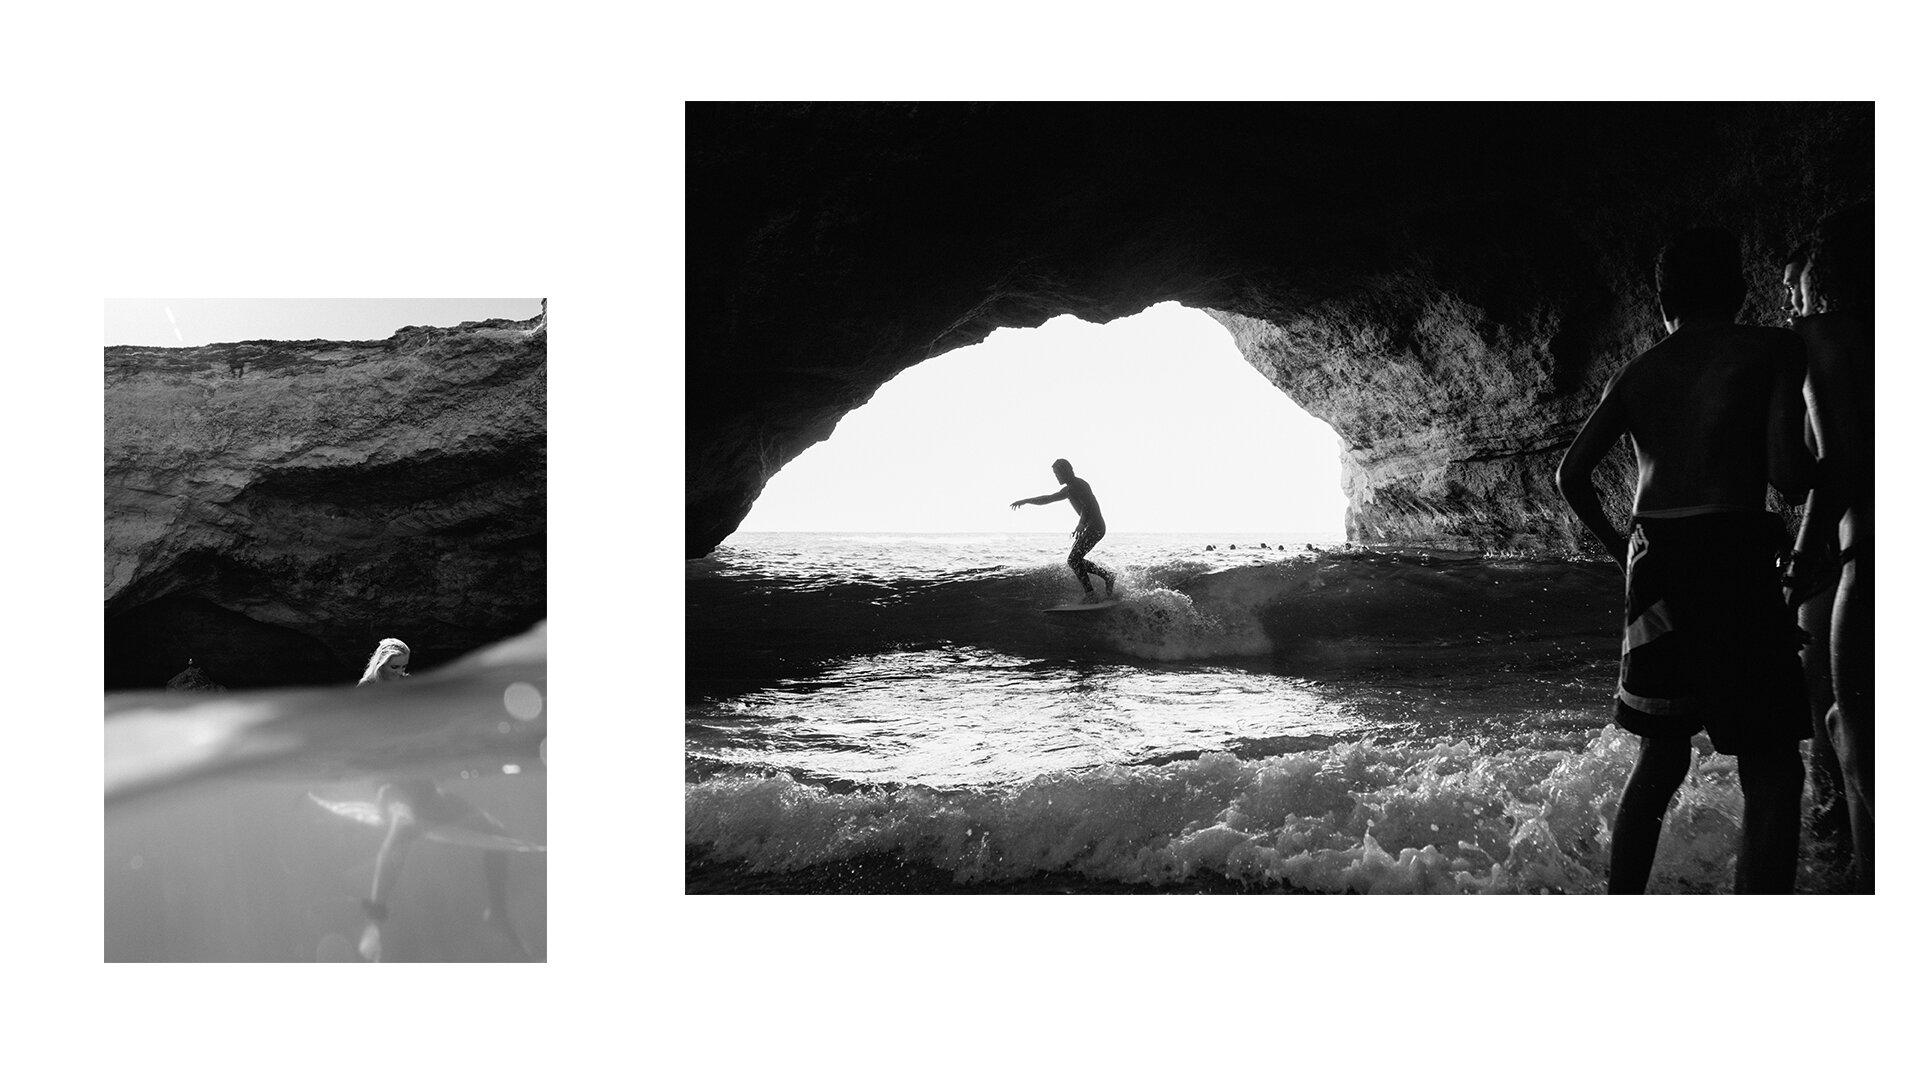 toby-butler-tobybutlerphoto-surf-surfing-waterphotography-ocean-Oneill-wetsuits-swimwear-girl-bikini-clothing-surf-portugal-lifestylephotography-8.jpg